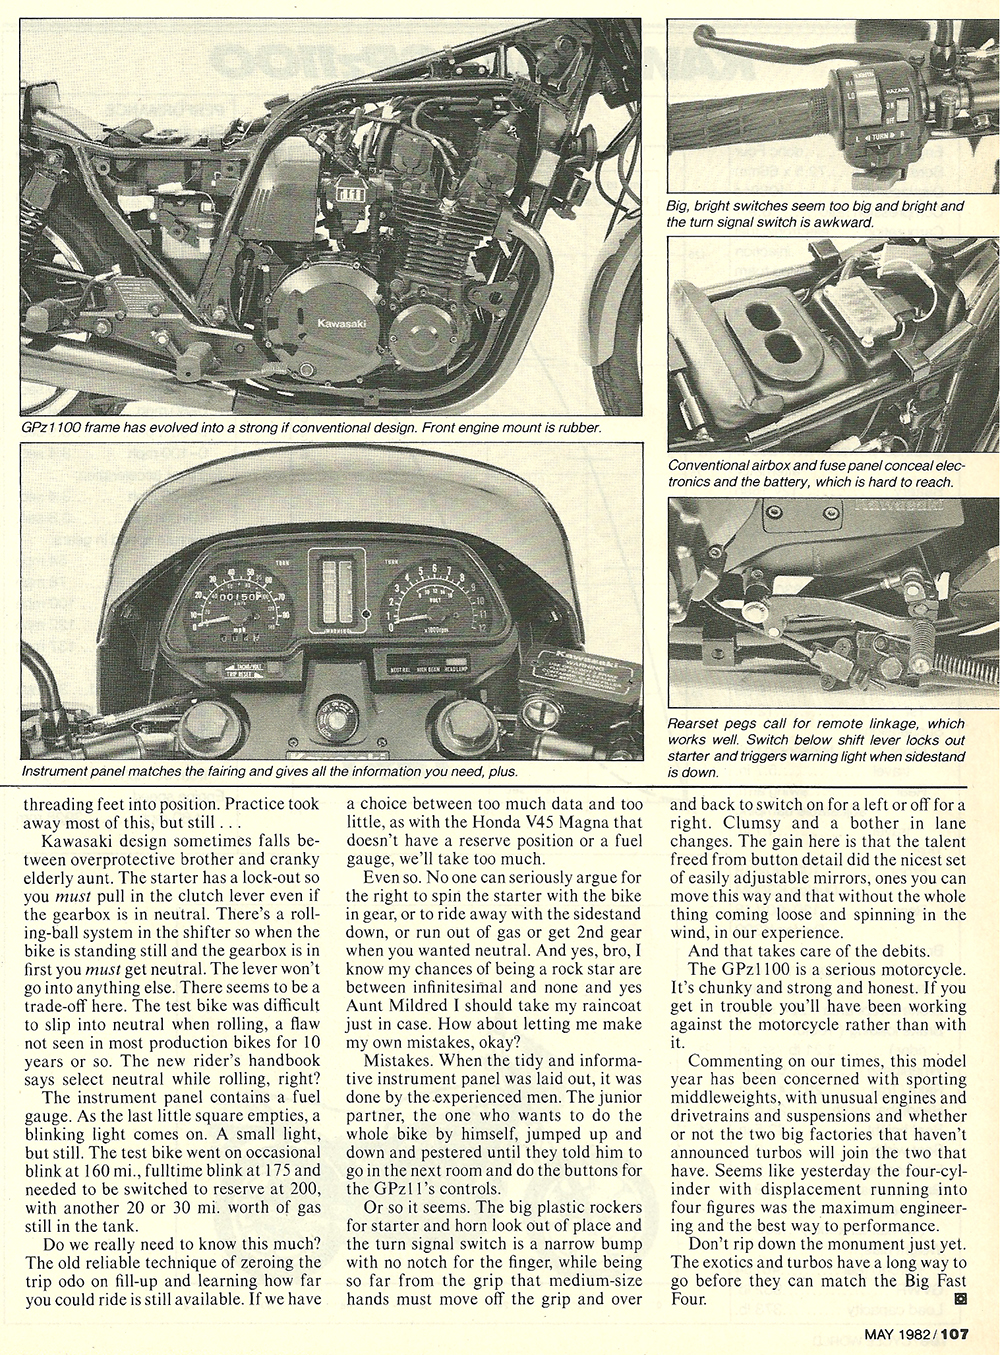 1982 Kawasaki GPz1100 road test 05.jpg